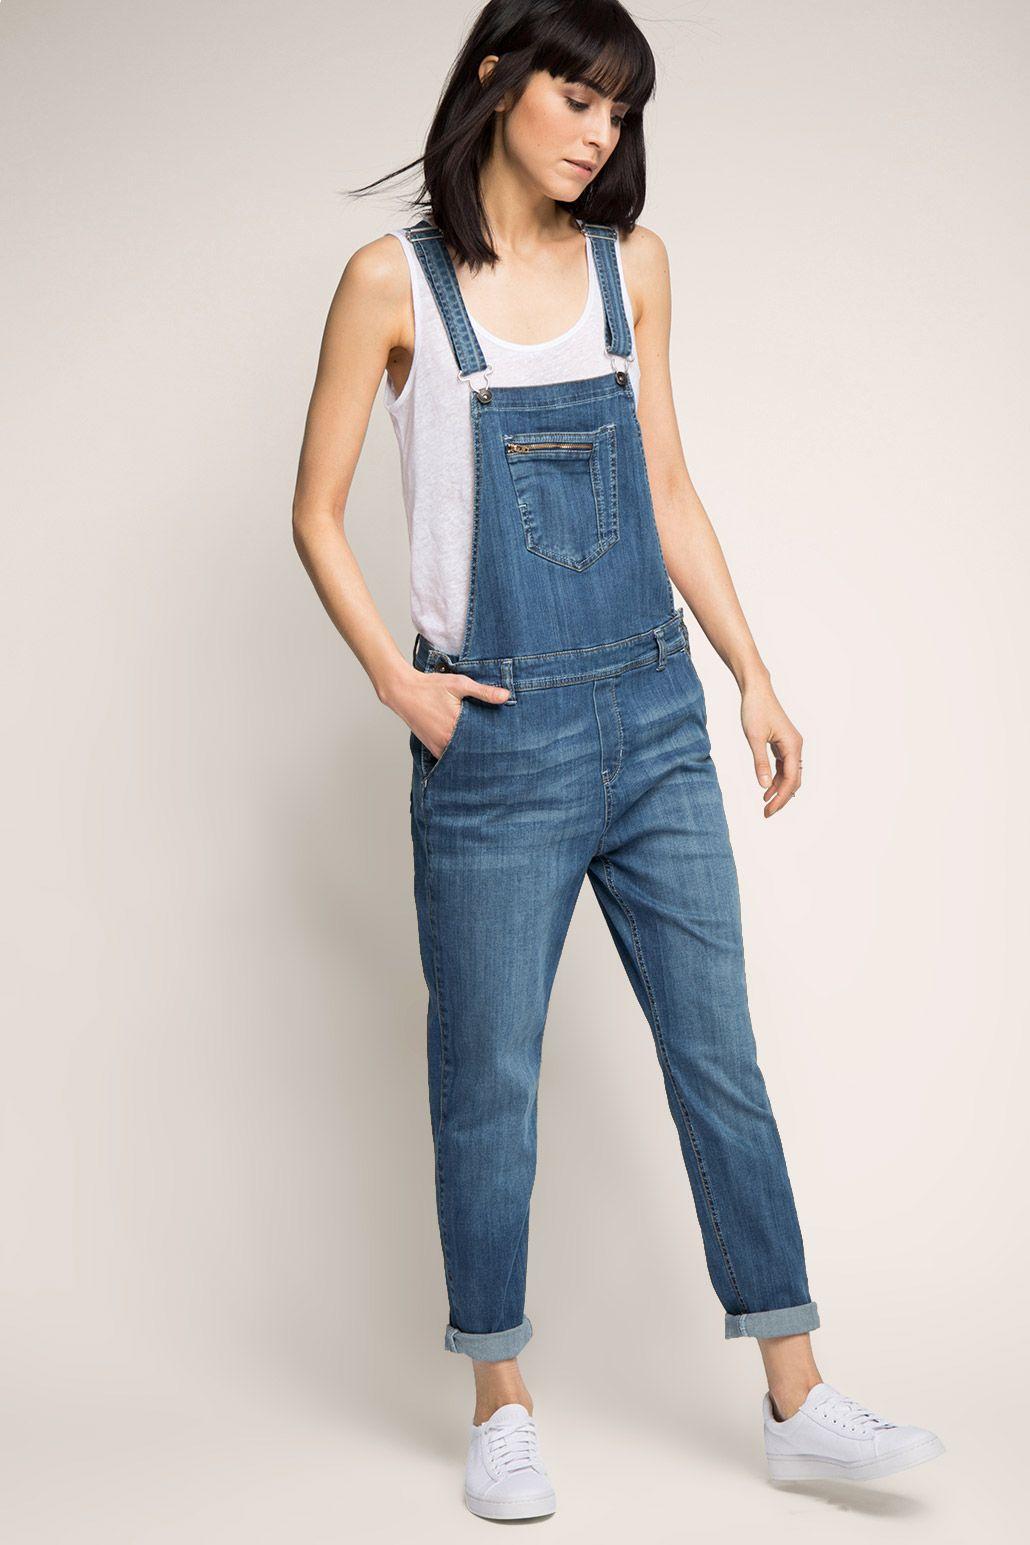 Jeans overall fur damen